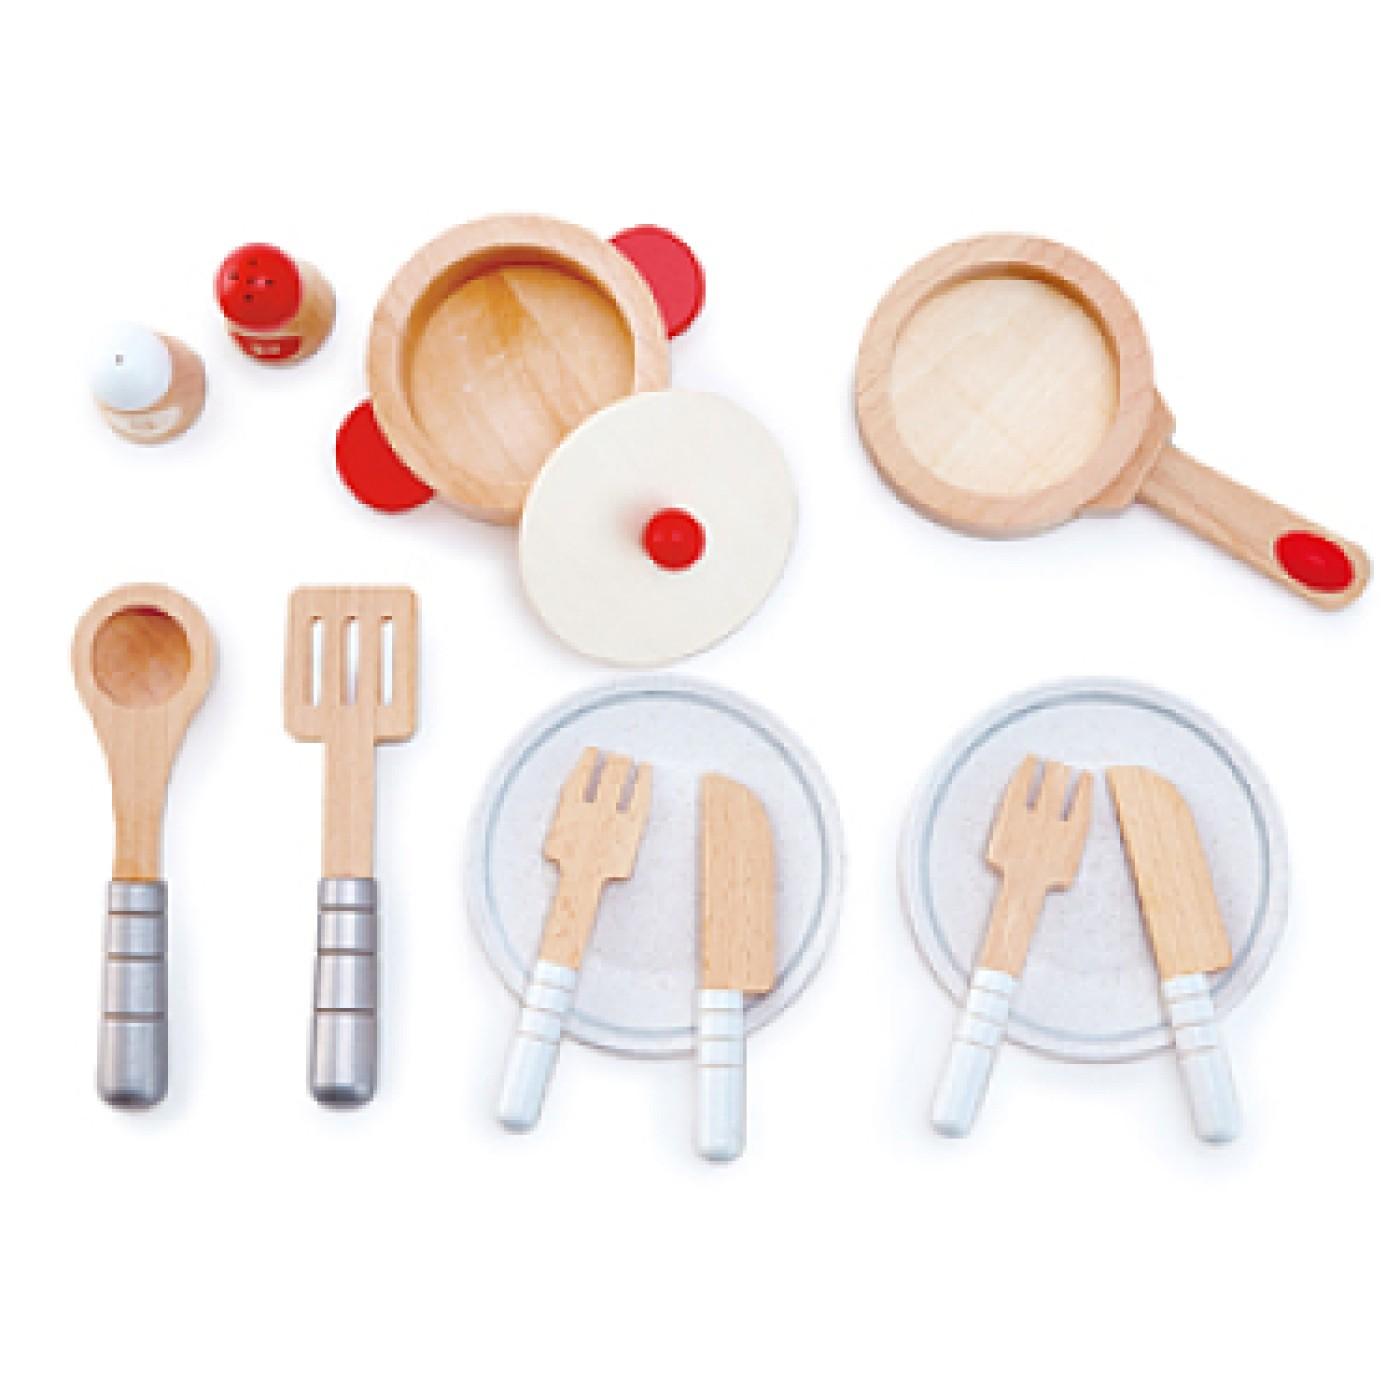 Cook And Serve Set